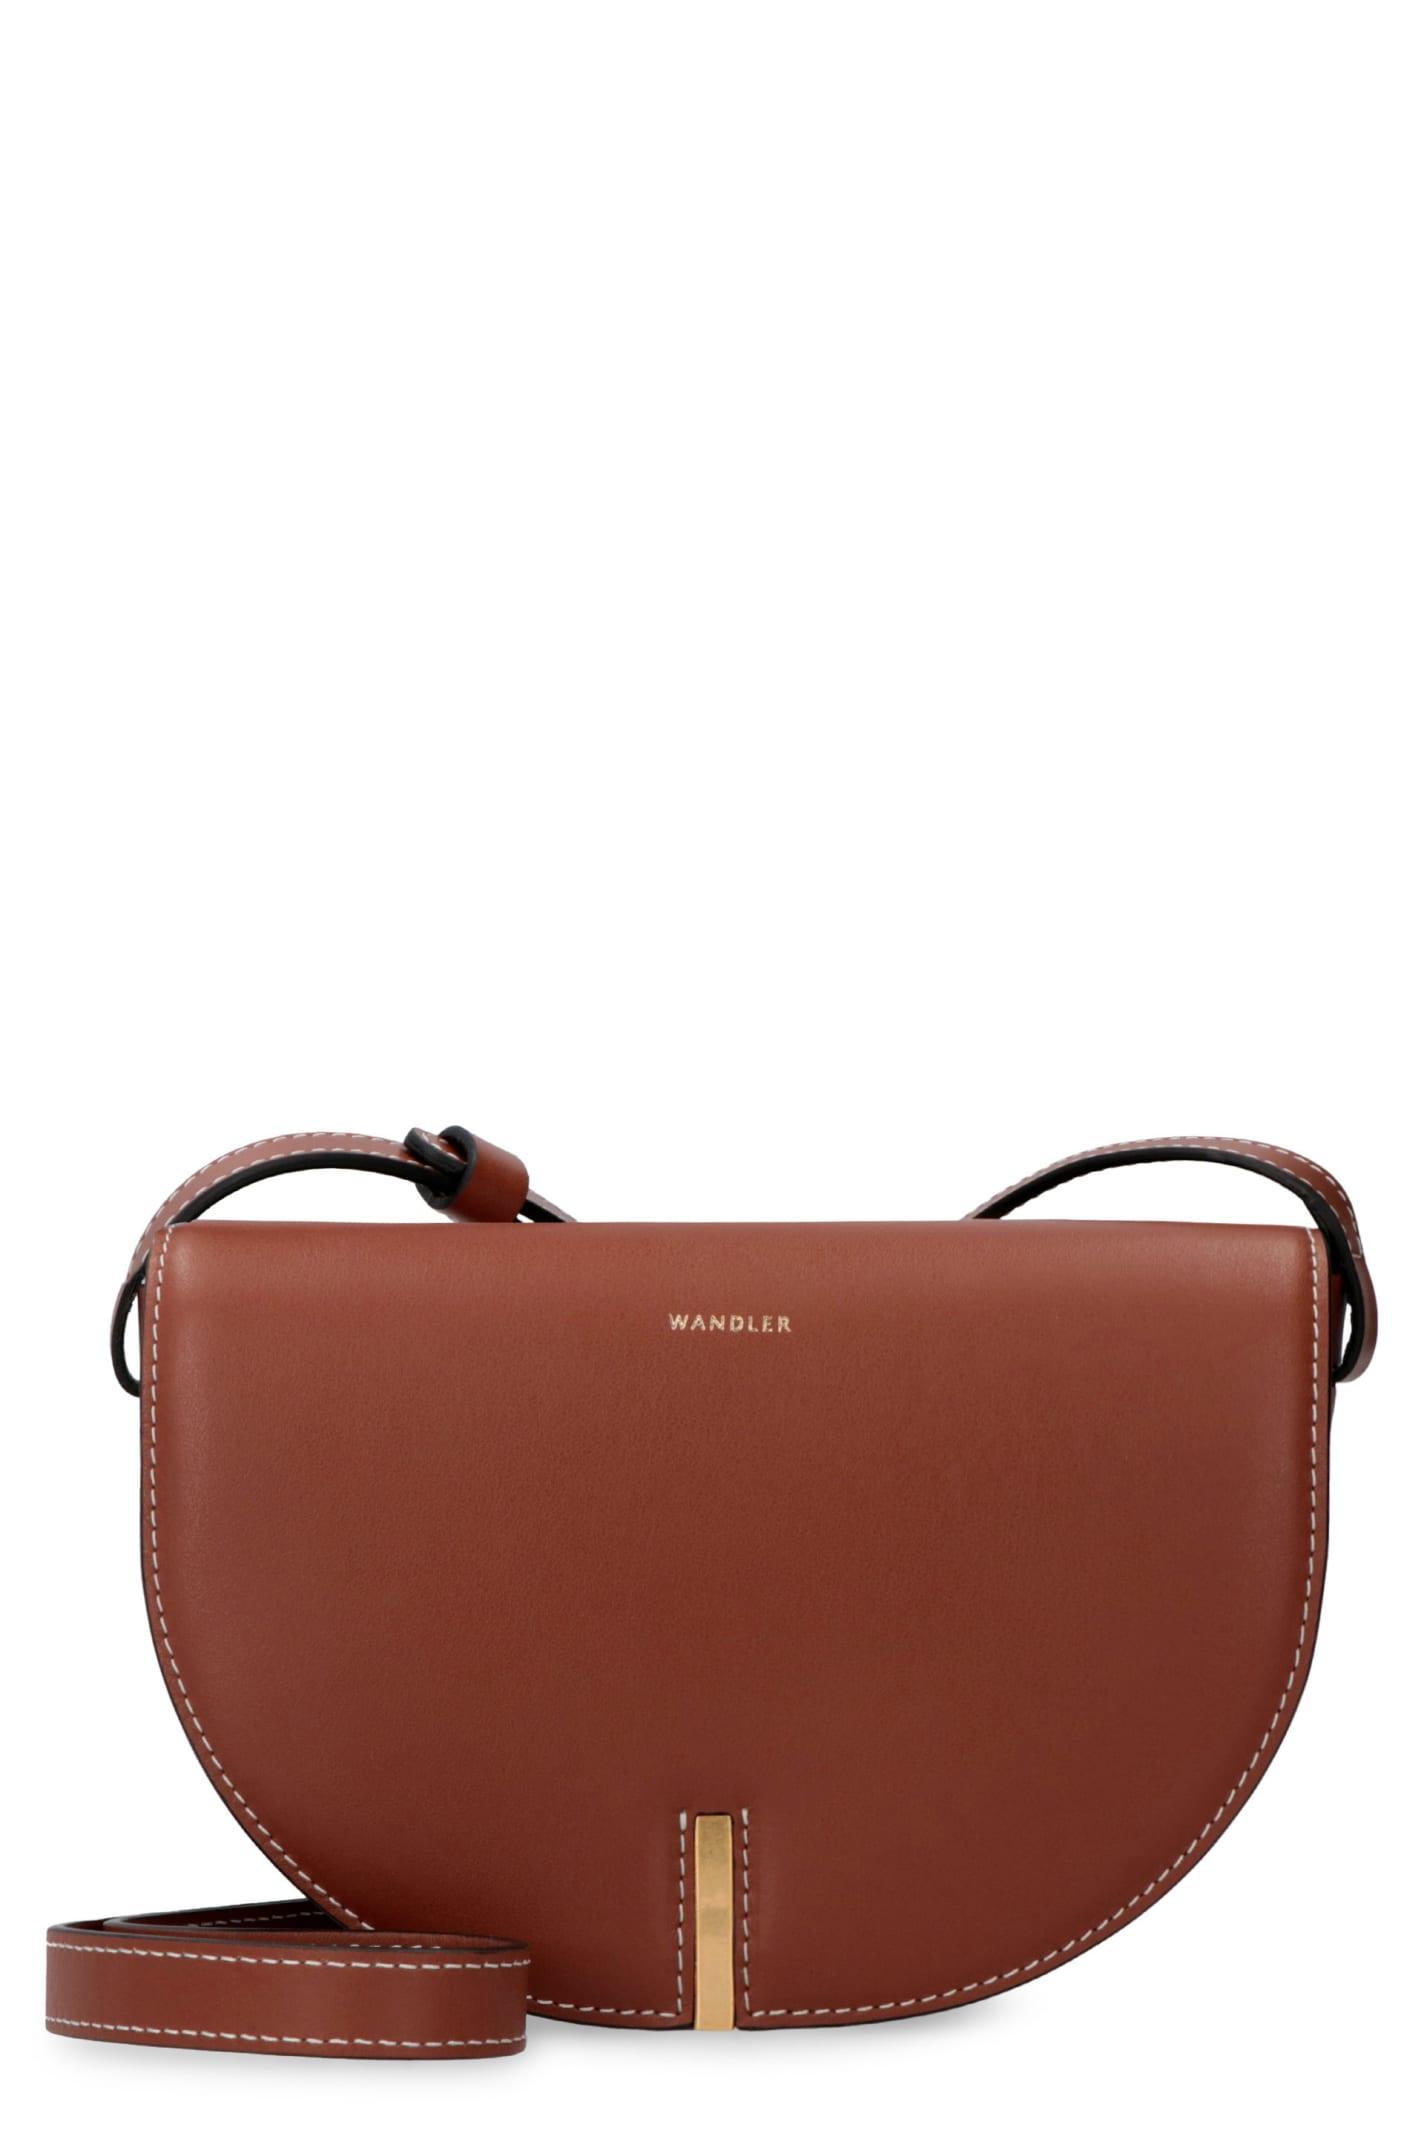 Wandler Nana Leather Crossbody Bag In Brown